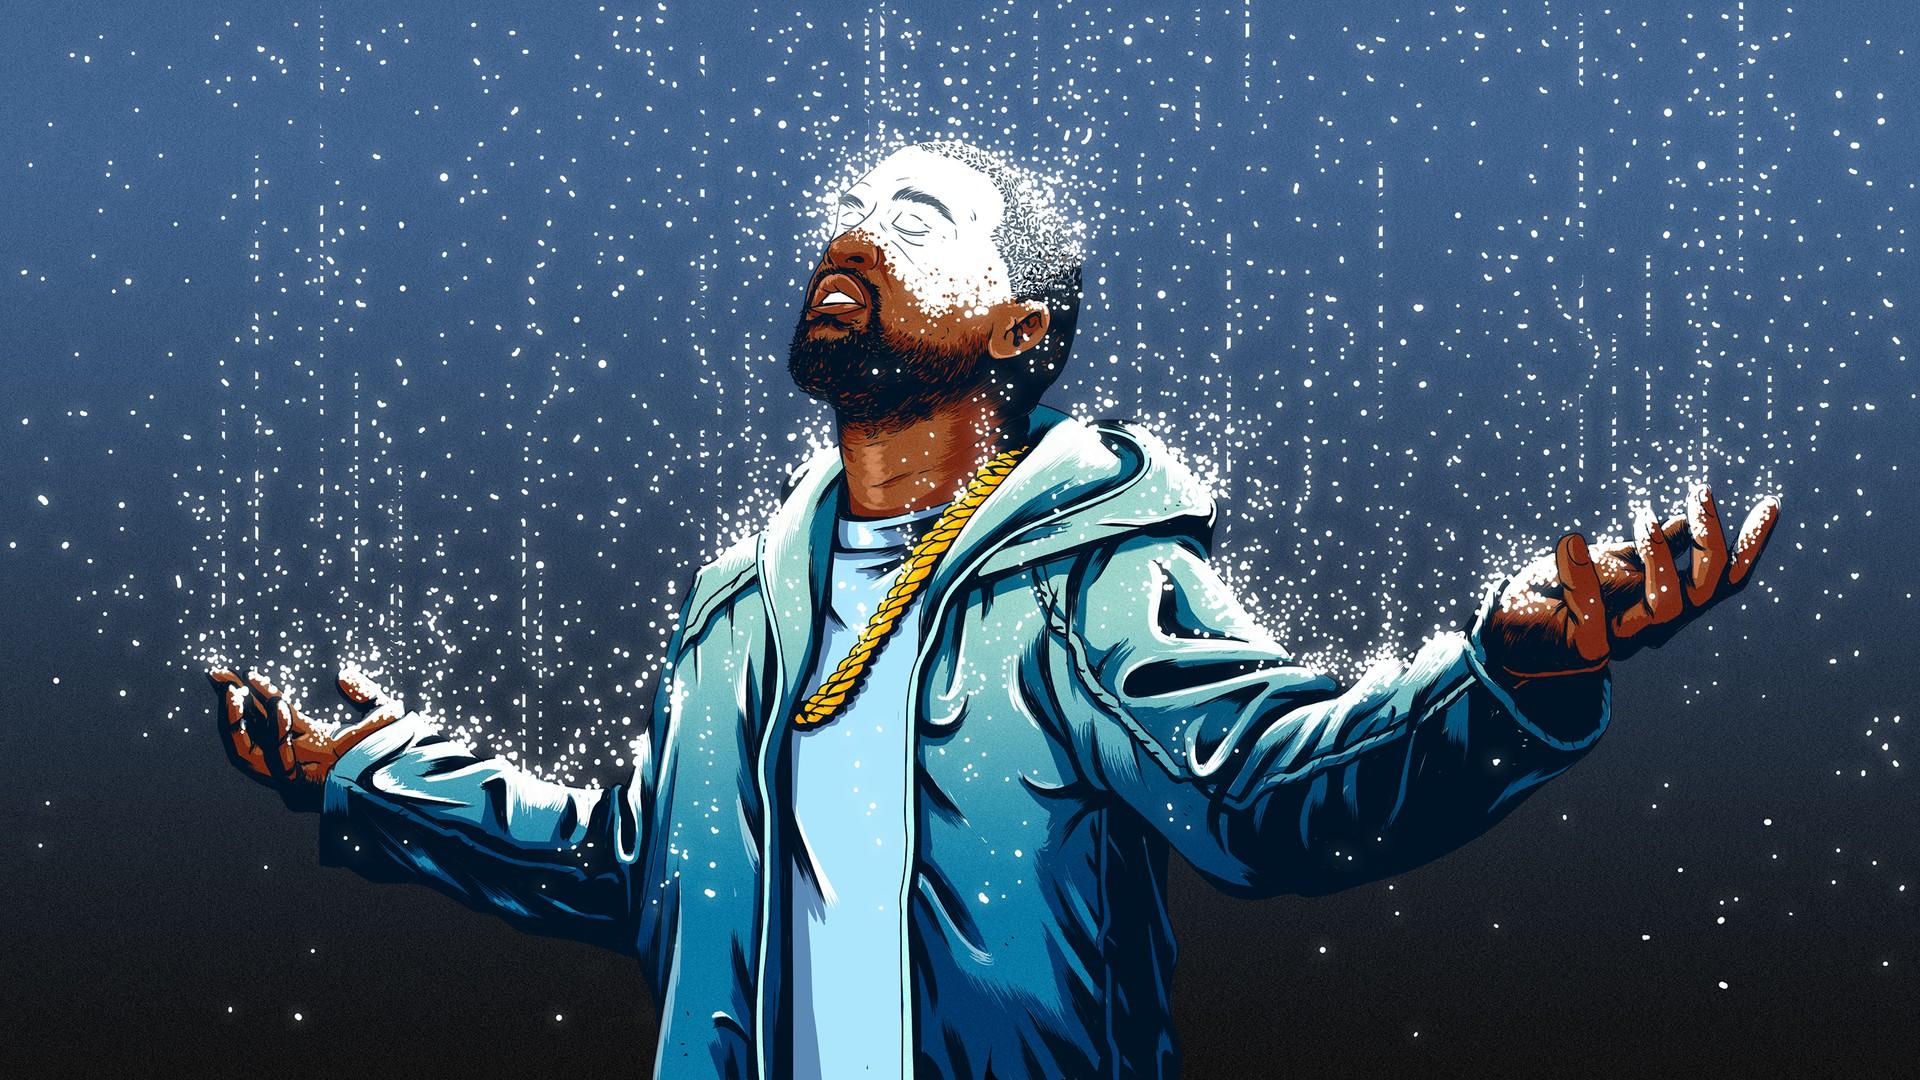 An illustration of cascading droplets turning Kanye West, a black man, white